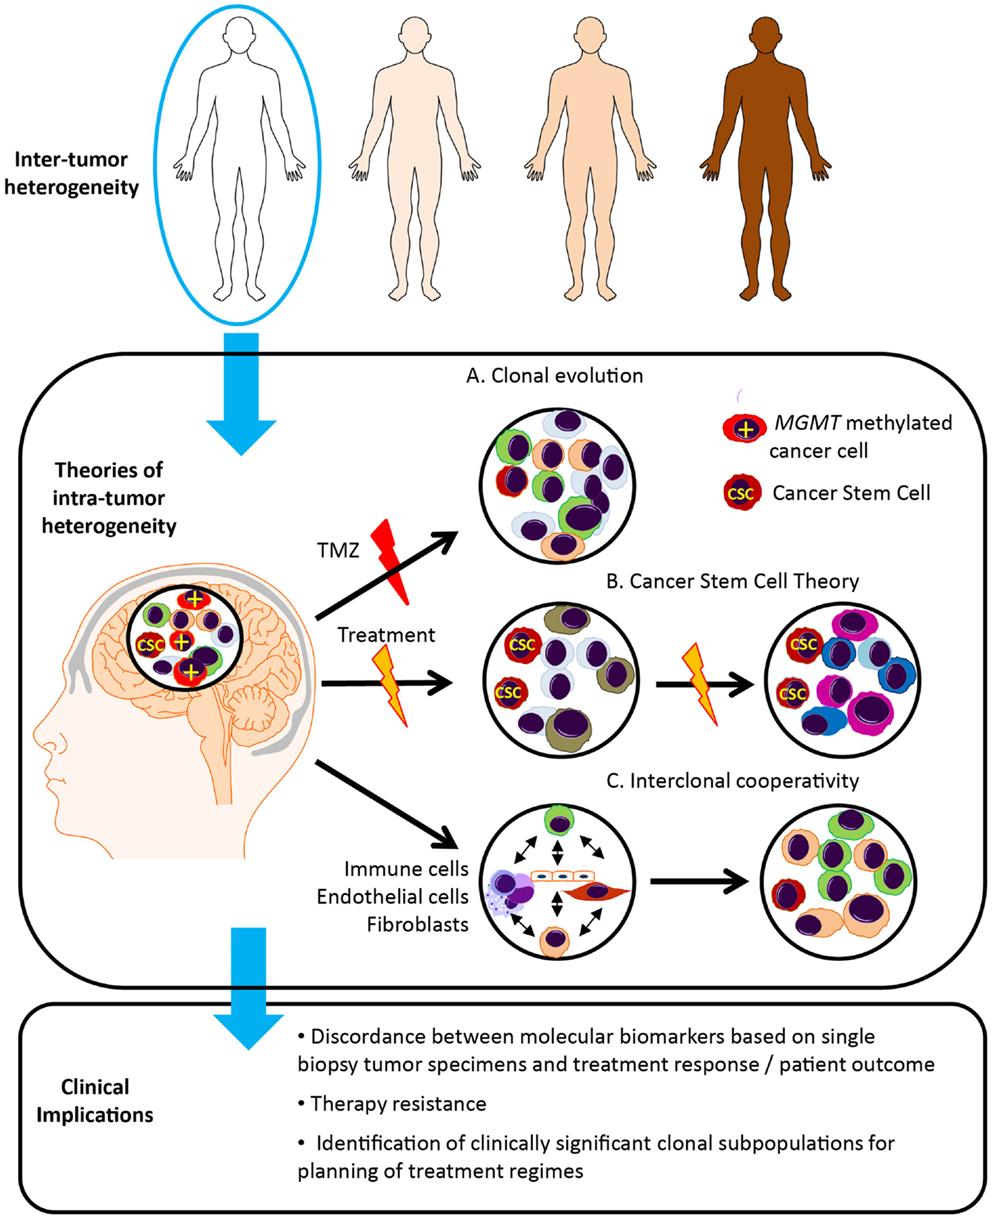 Frontiers | Molecular Heterogeneity in Glioblastoma